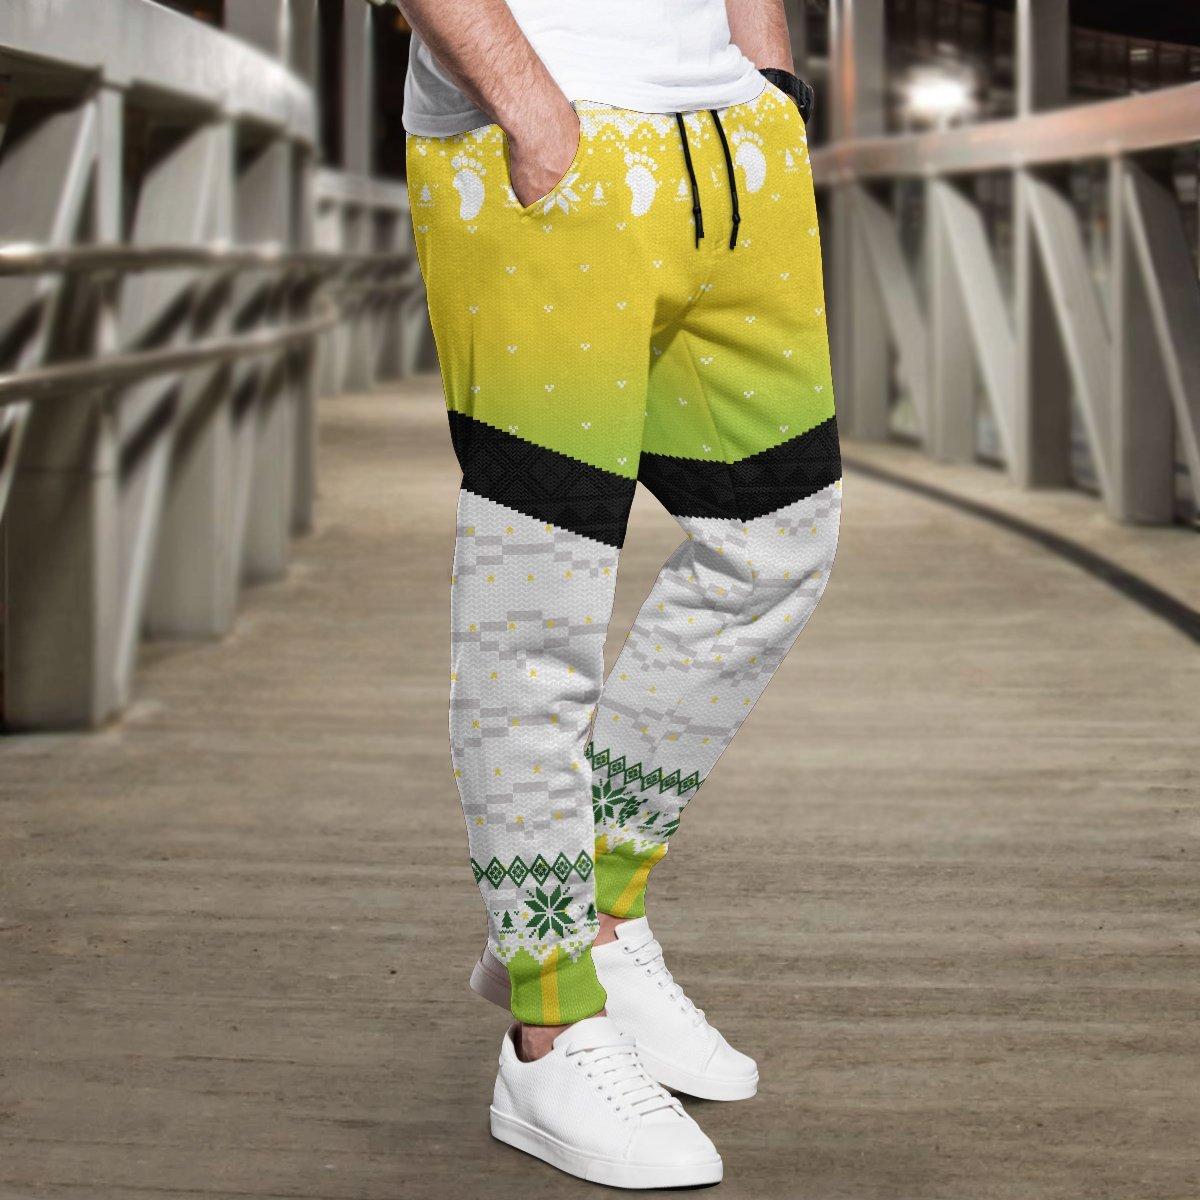 team itachiyama christmas jogger pants 931020 - Otaku Treat